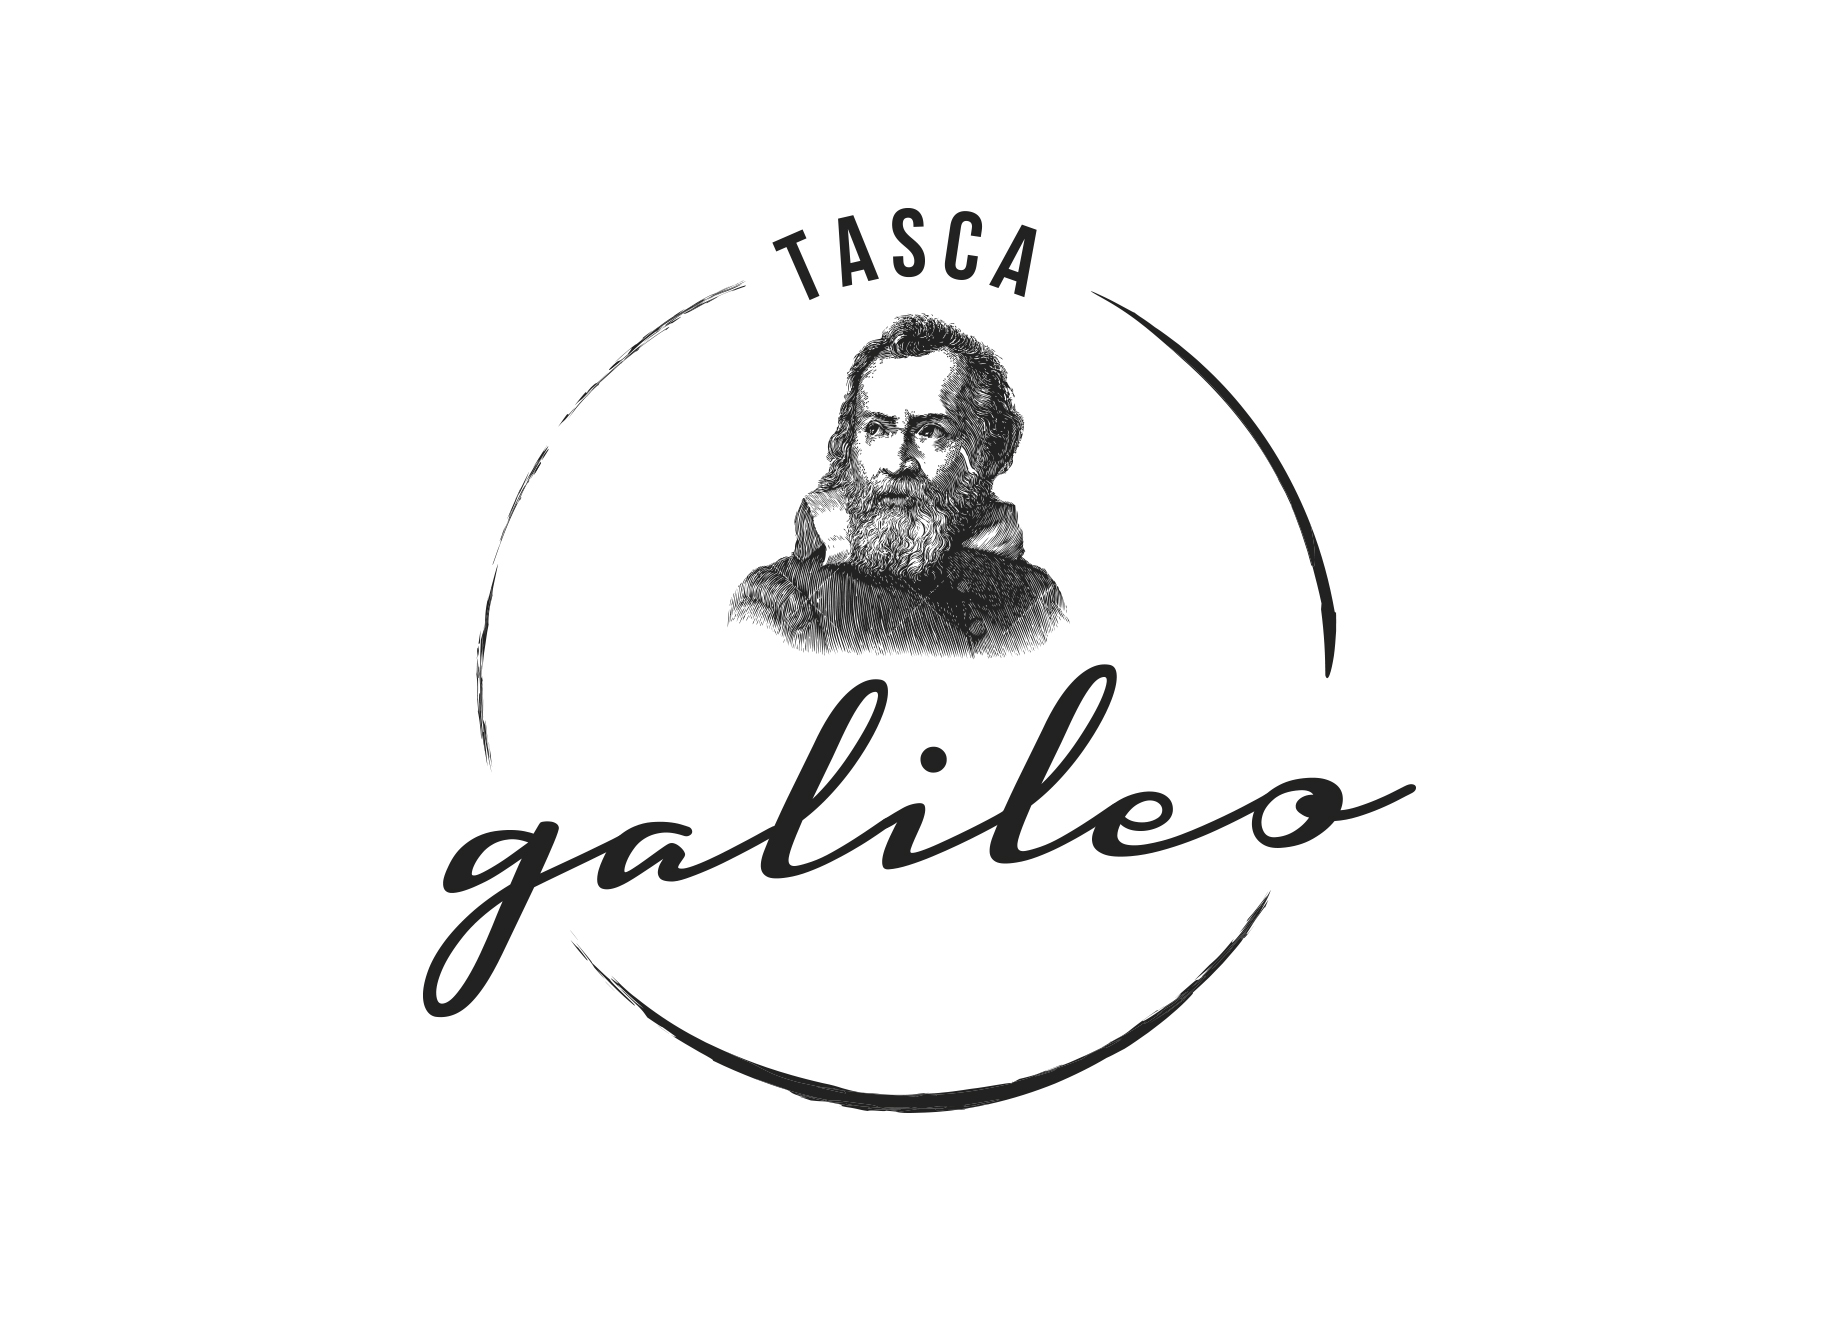 THE OFFICE_GALILEO7.jpg